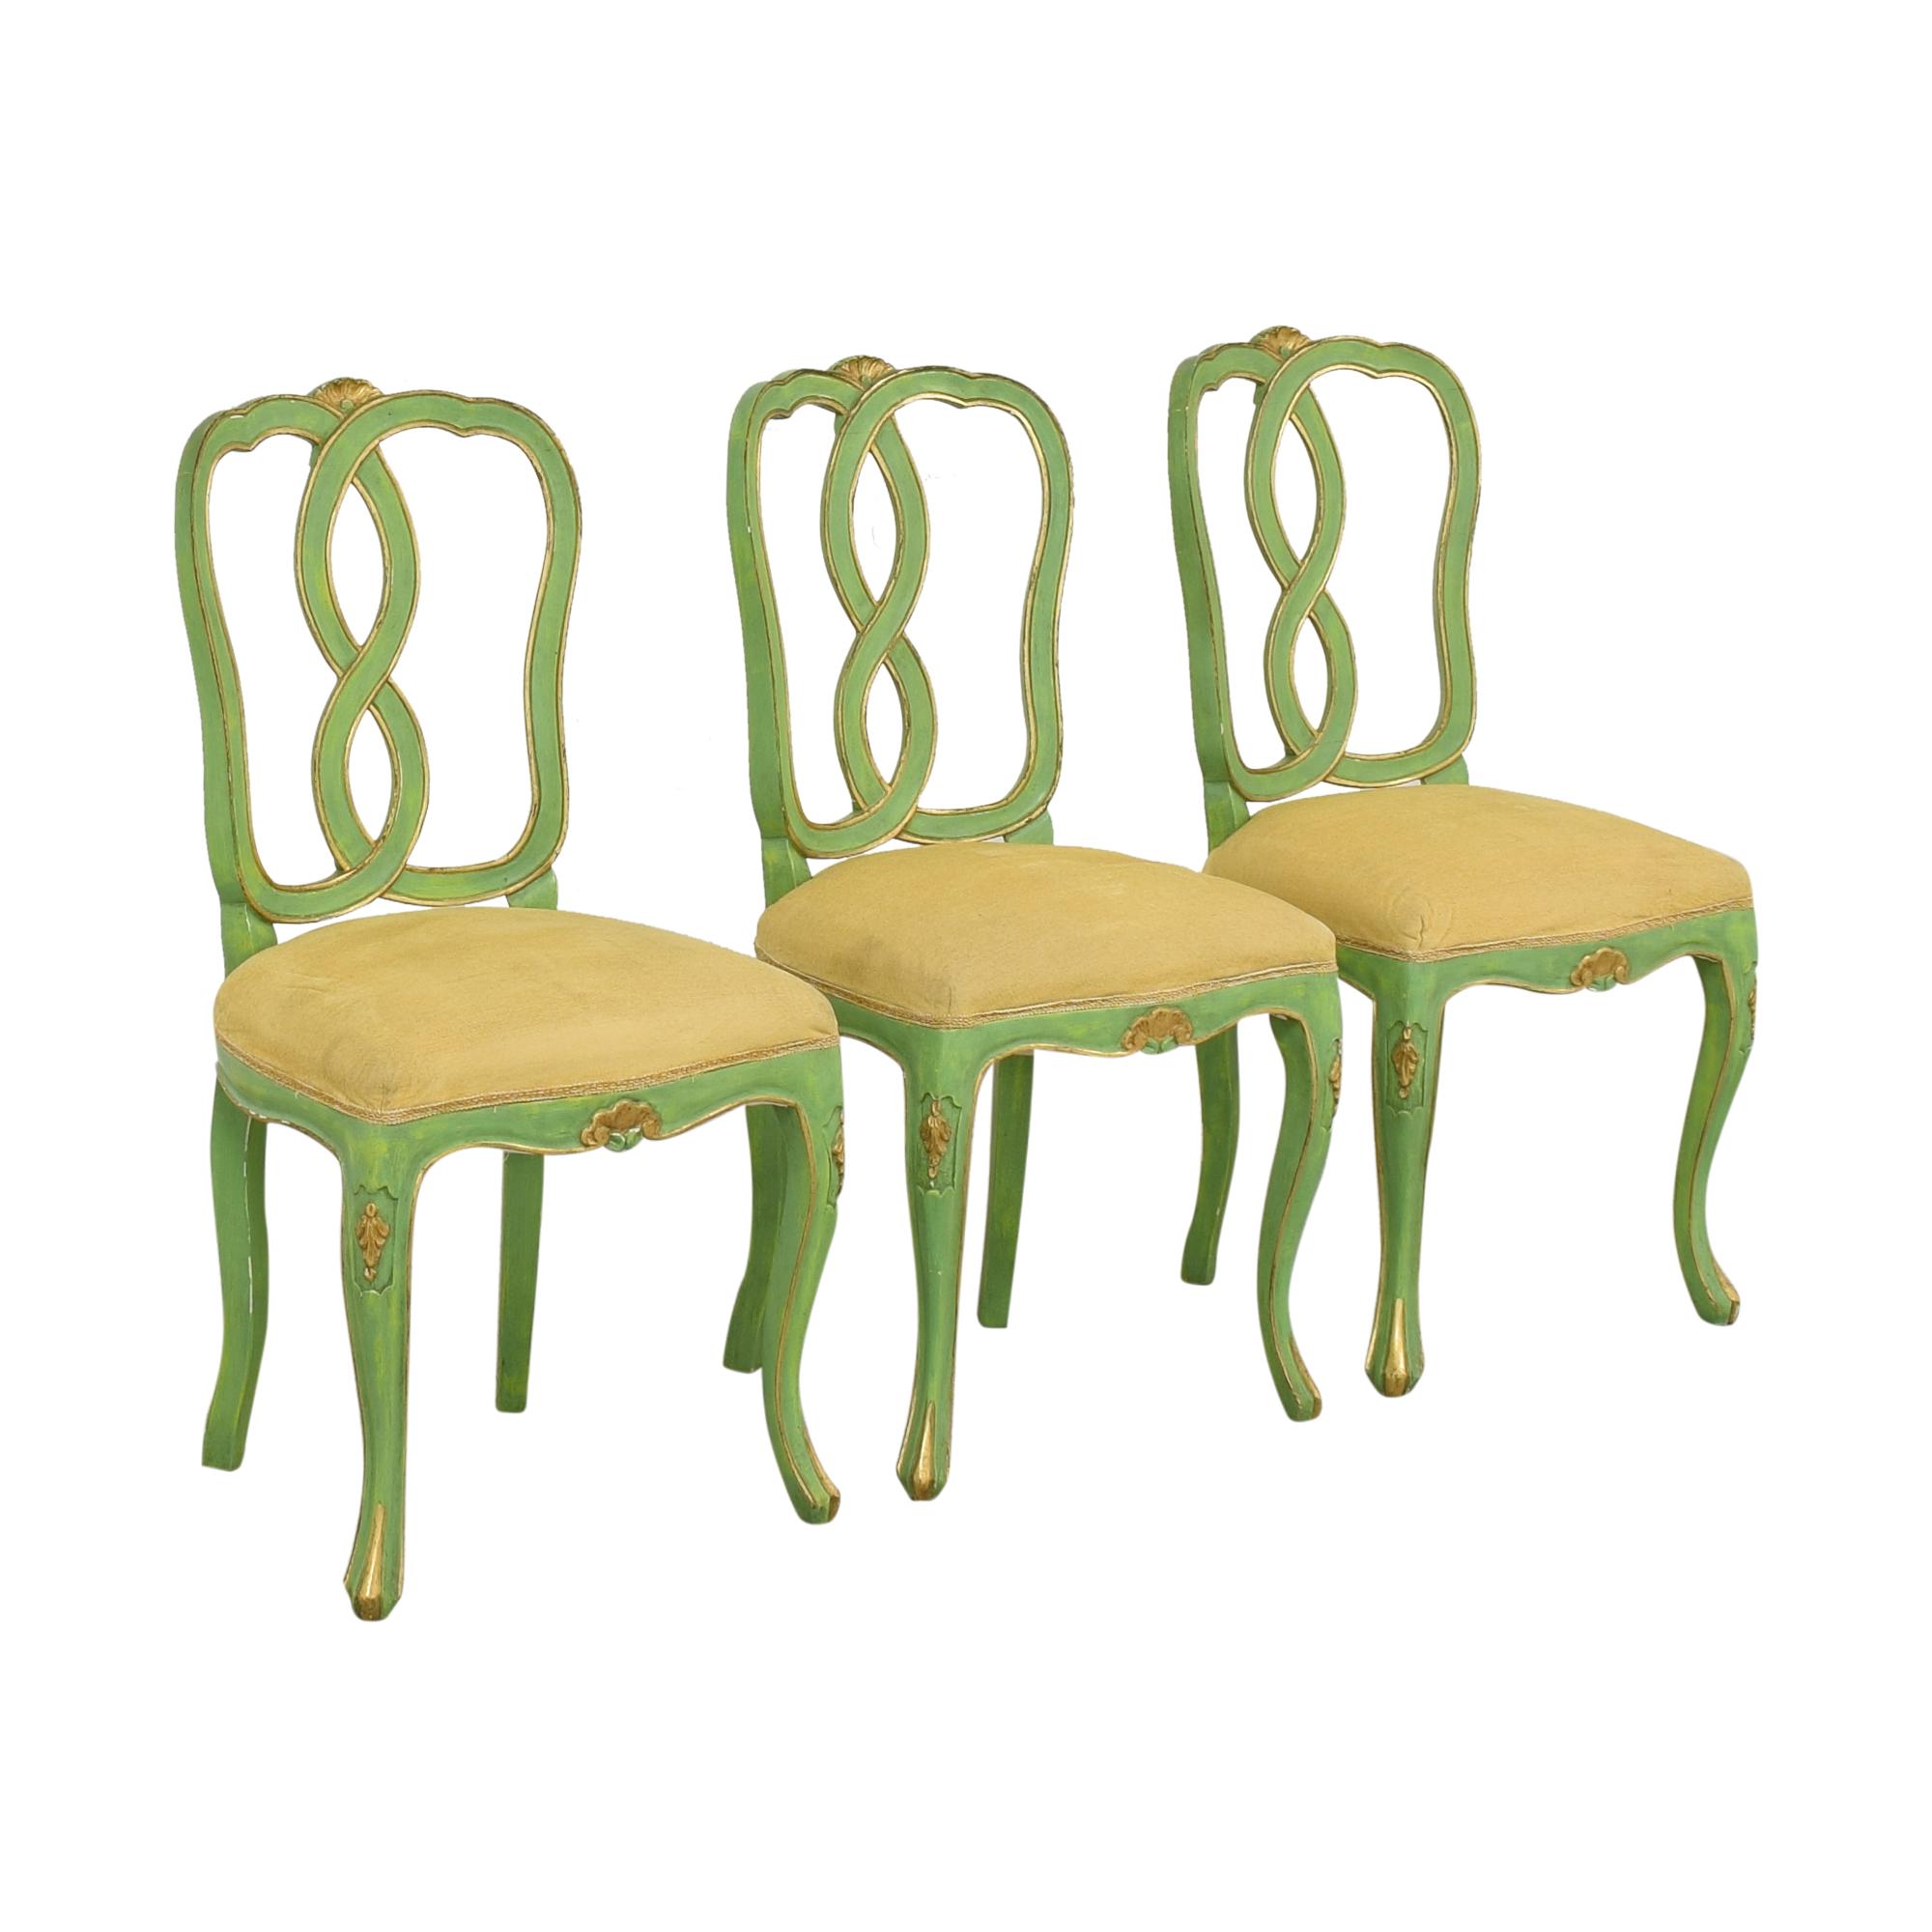 Bergdorf Goodman Bergdorf Goodman Green and Gold Chairs nyc